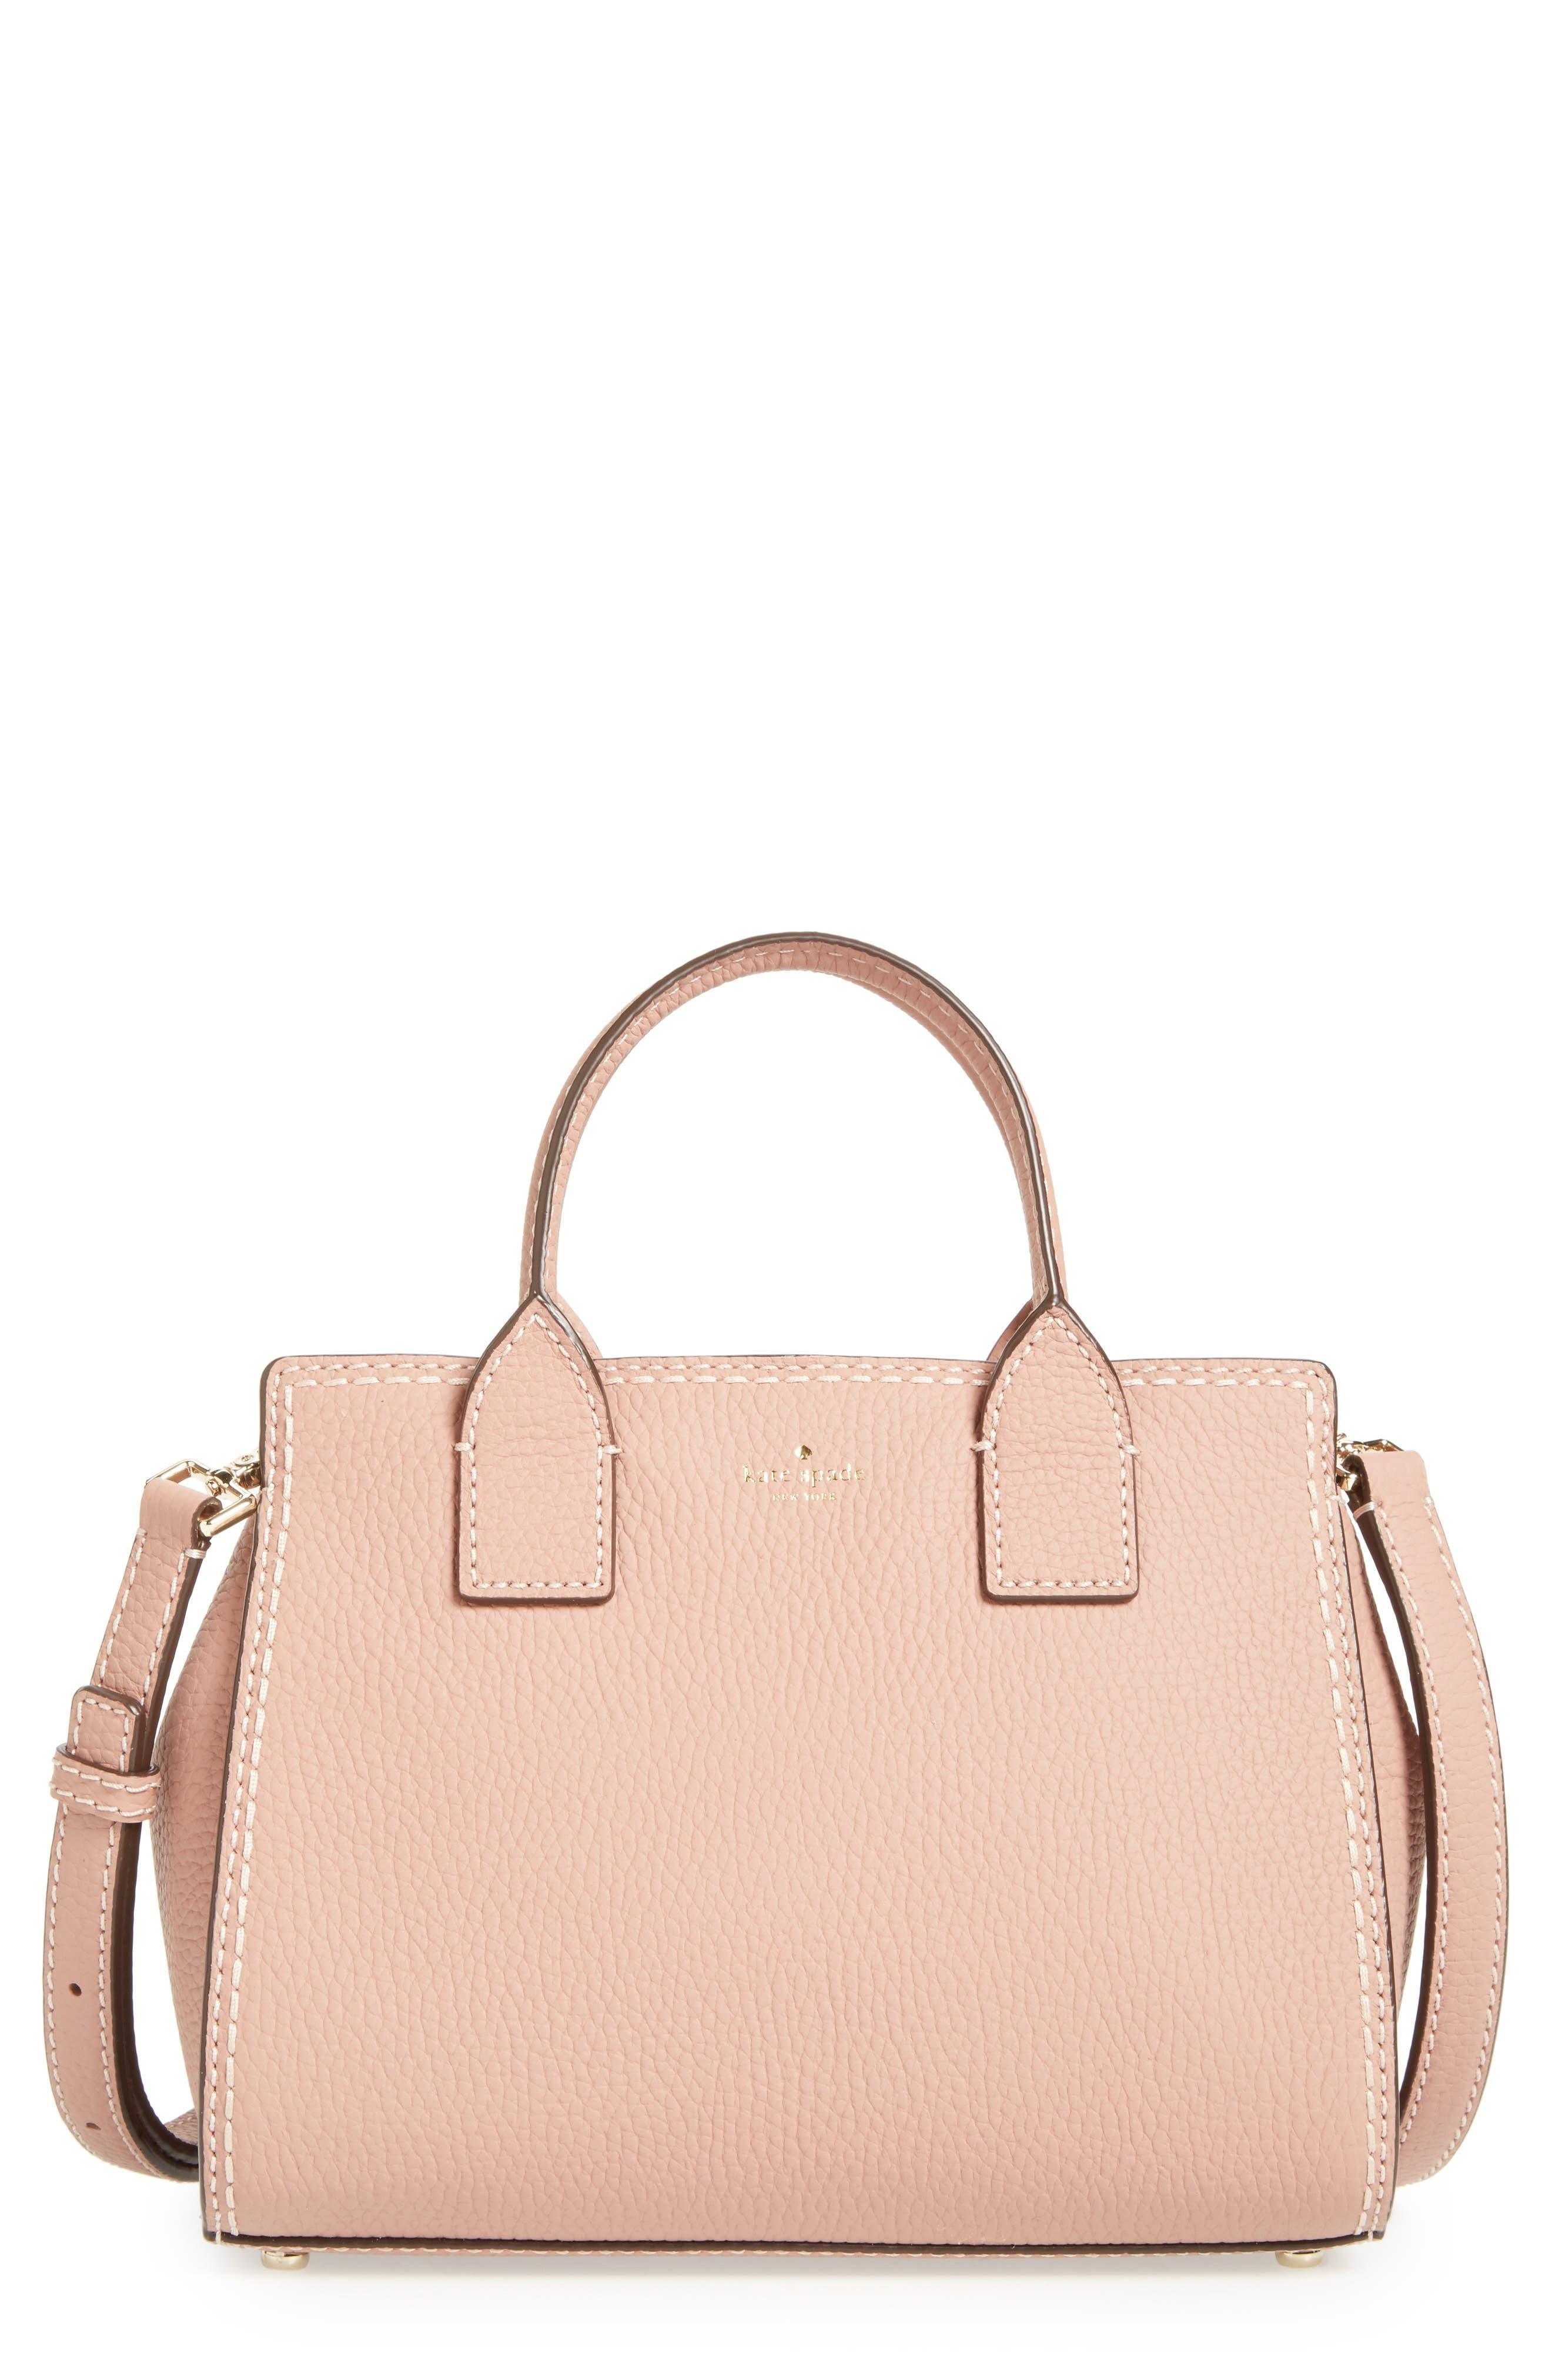 Pink Satchel Purses & Handbags | Nordstrom